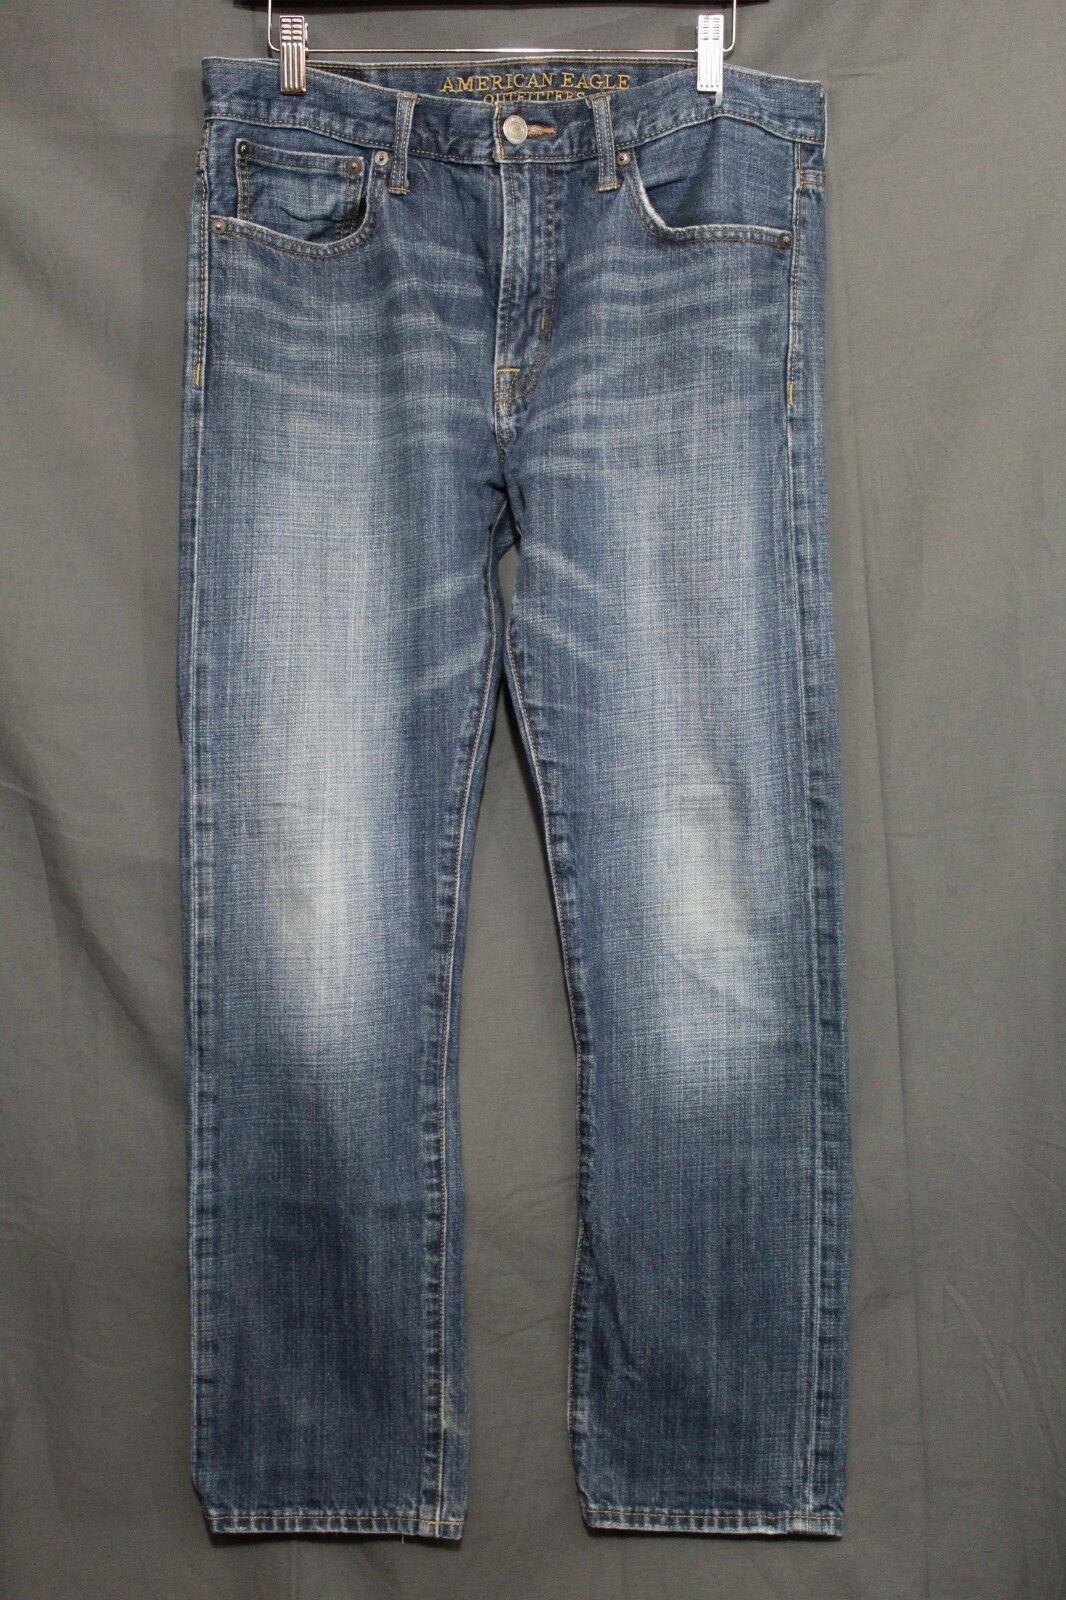 Men's AE Slim Jeans Faded Medium Blue Wash Distressed American Eagle 32 x 30